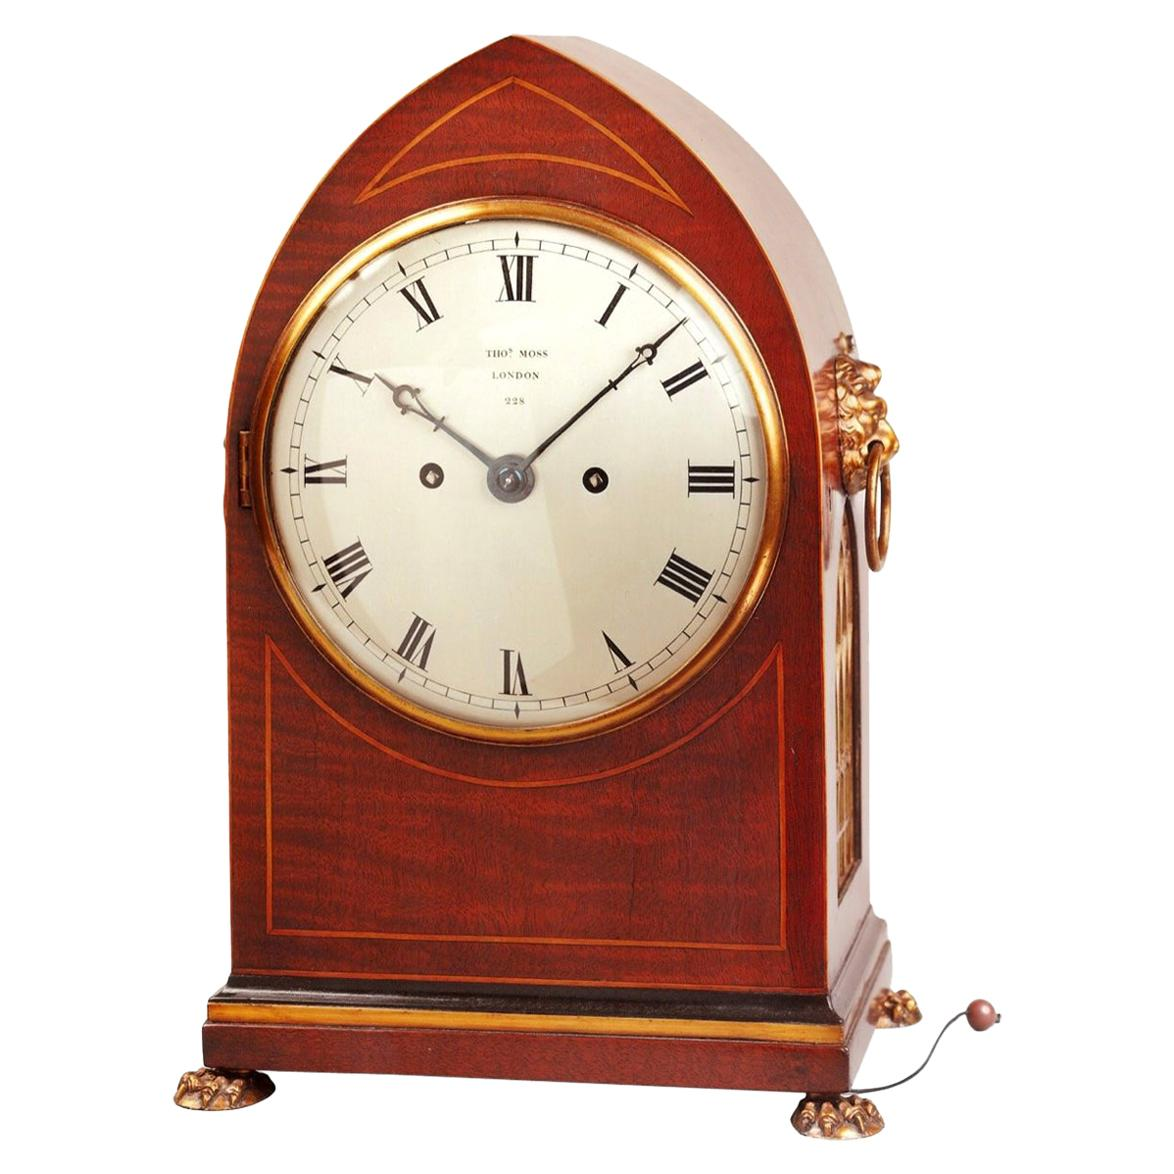 19th Century Antique Regency Mahogany Bracket Clock by Thomas Moss of London